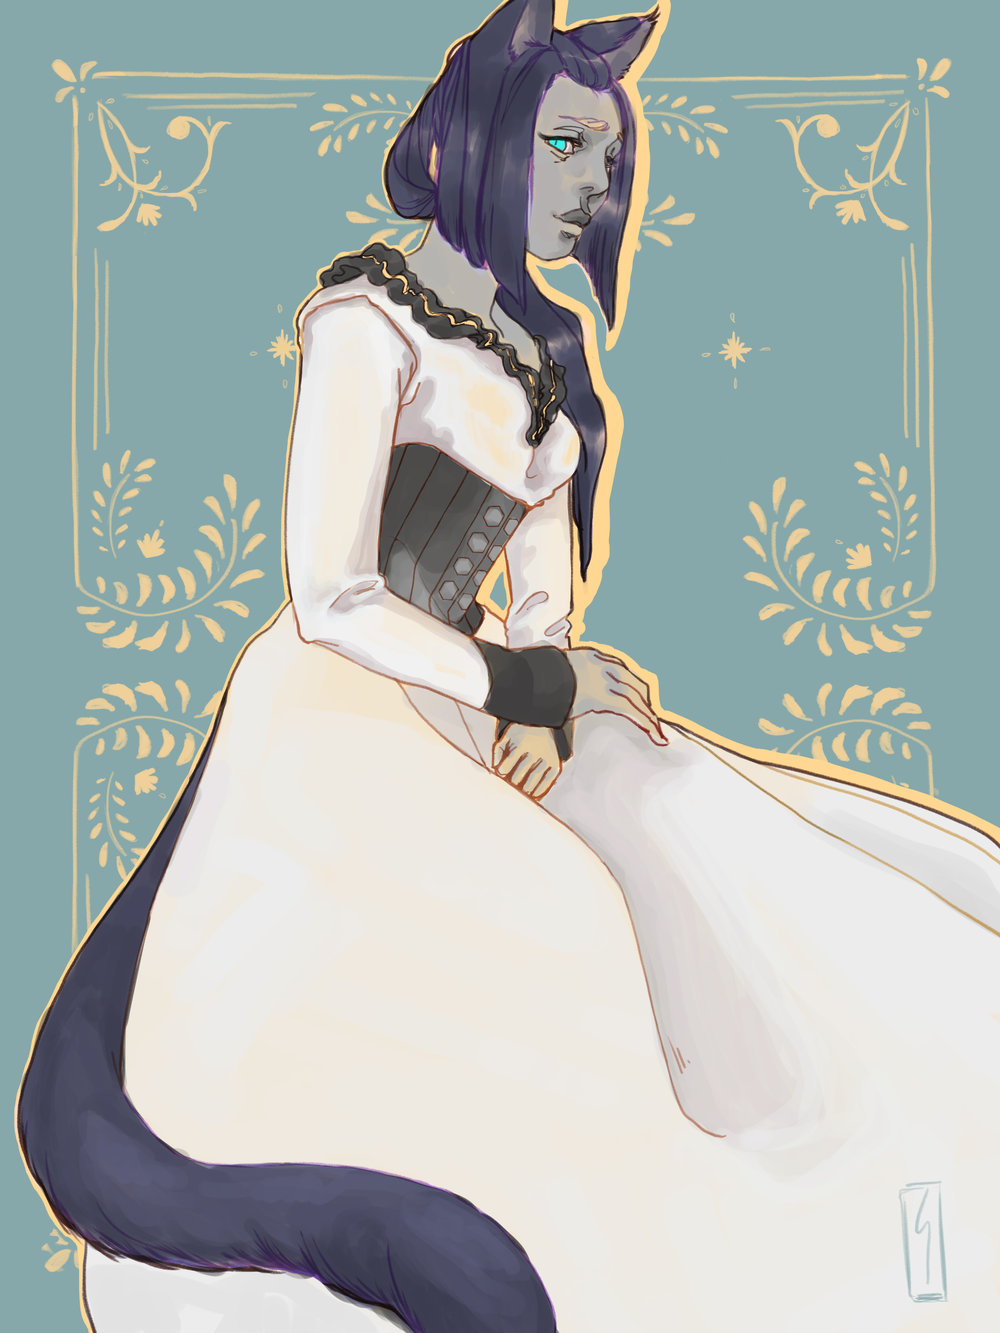 FFXIV Fanart - Kohete Naos, thavnairian woolen dress